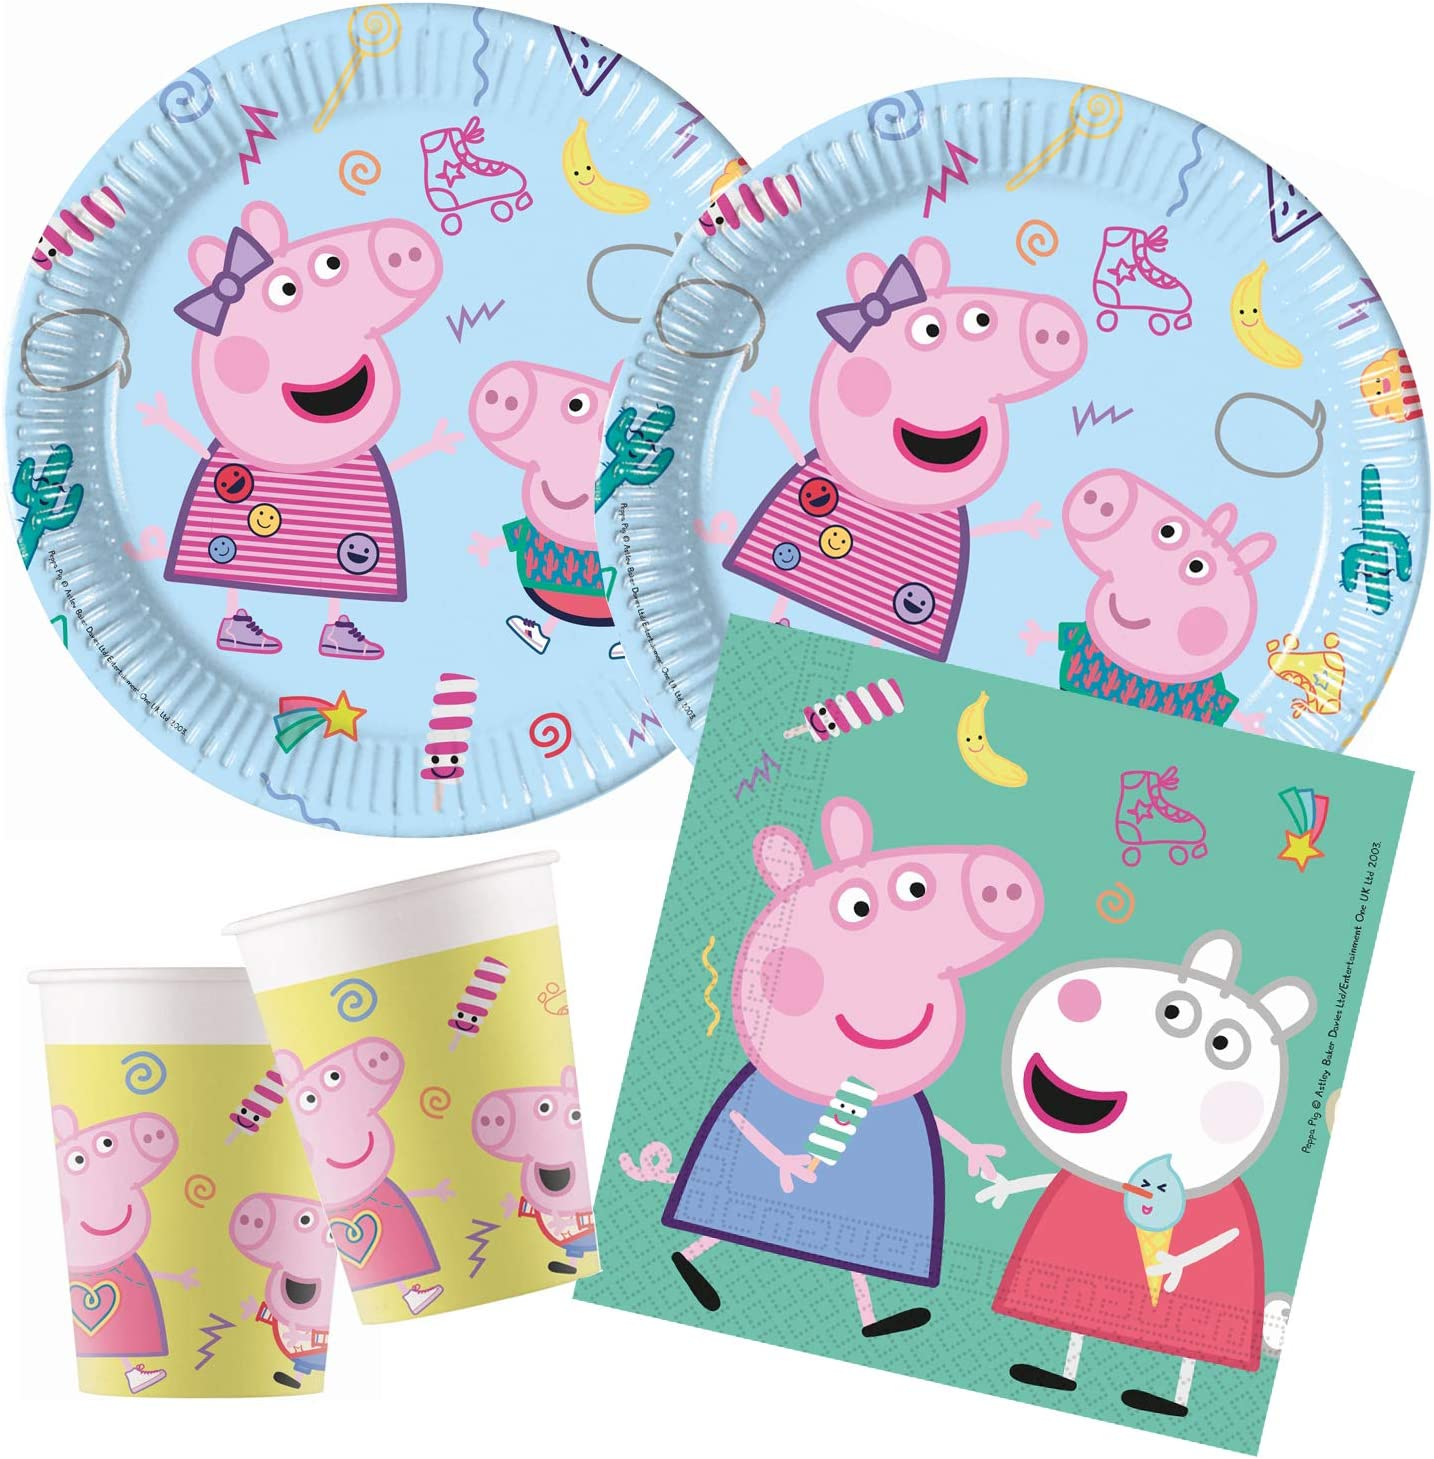 Procos- Peppa Pig Messy Play - Set de Fiesta (tamaño pequeño) (10133996B)